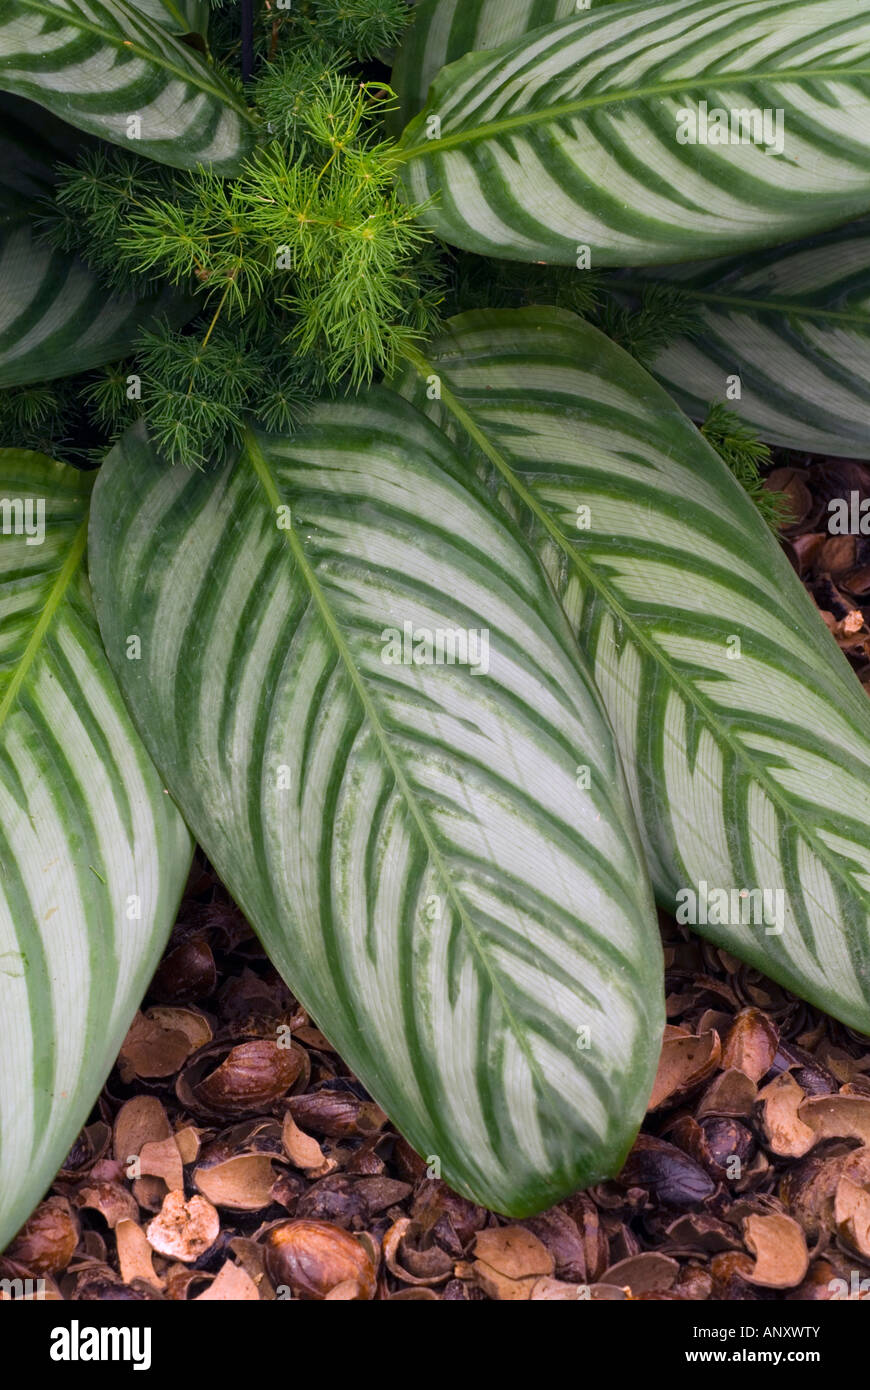 Best Kitchen Gallery: Houseplant Ctenanthe Setosa Aka Calathea Striped Marantha Tropical of Tropical Foliage Houseplants on rachelxblog.com